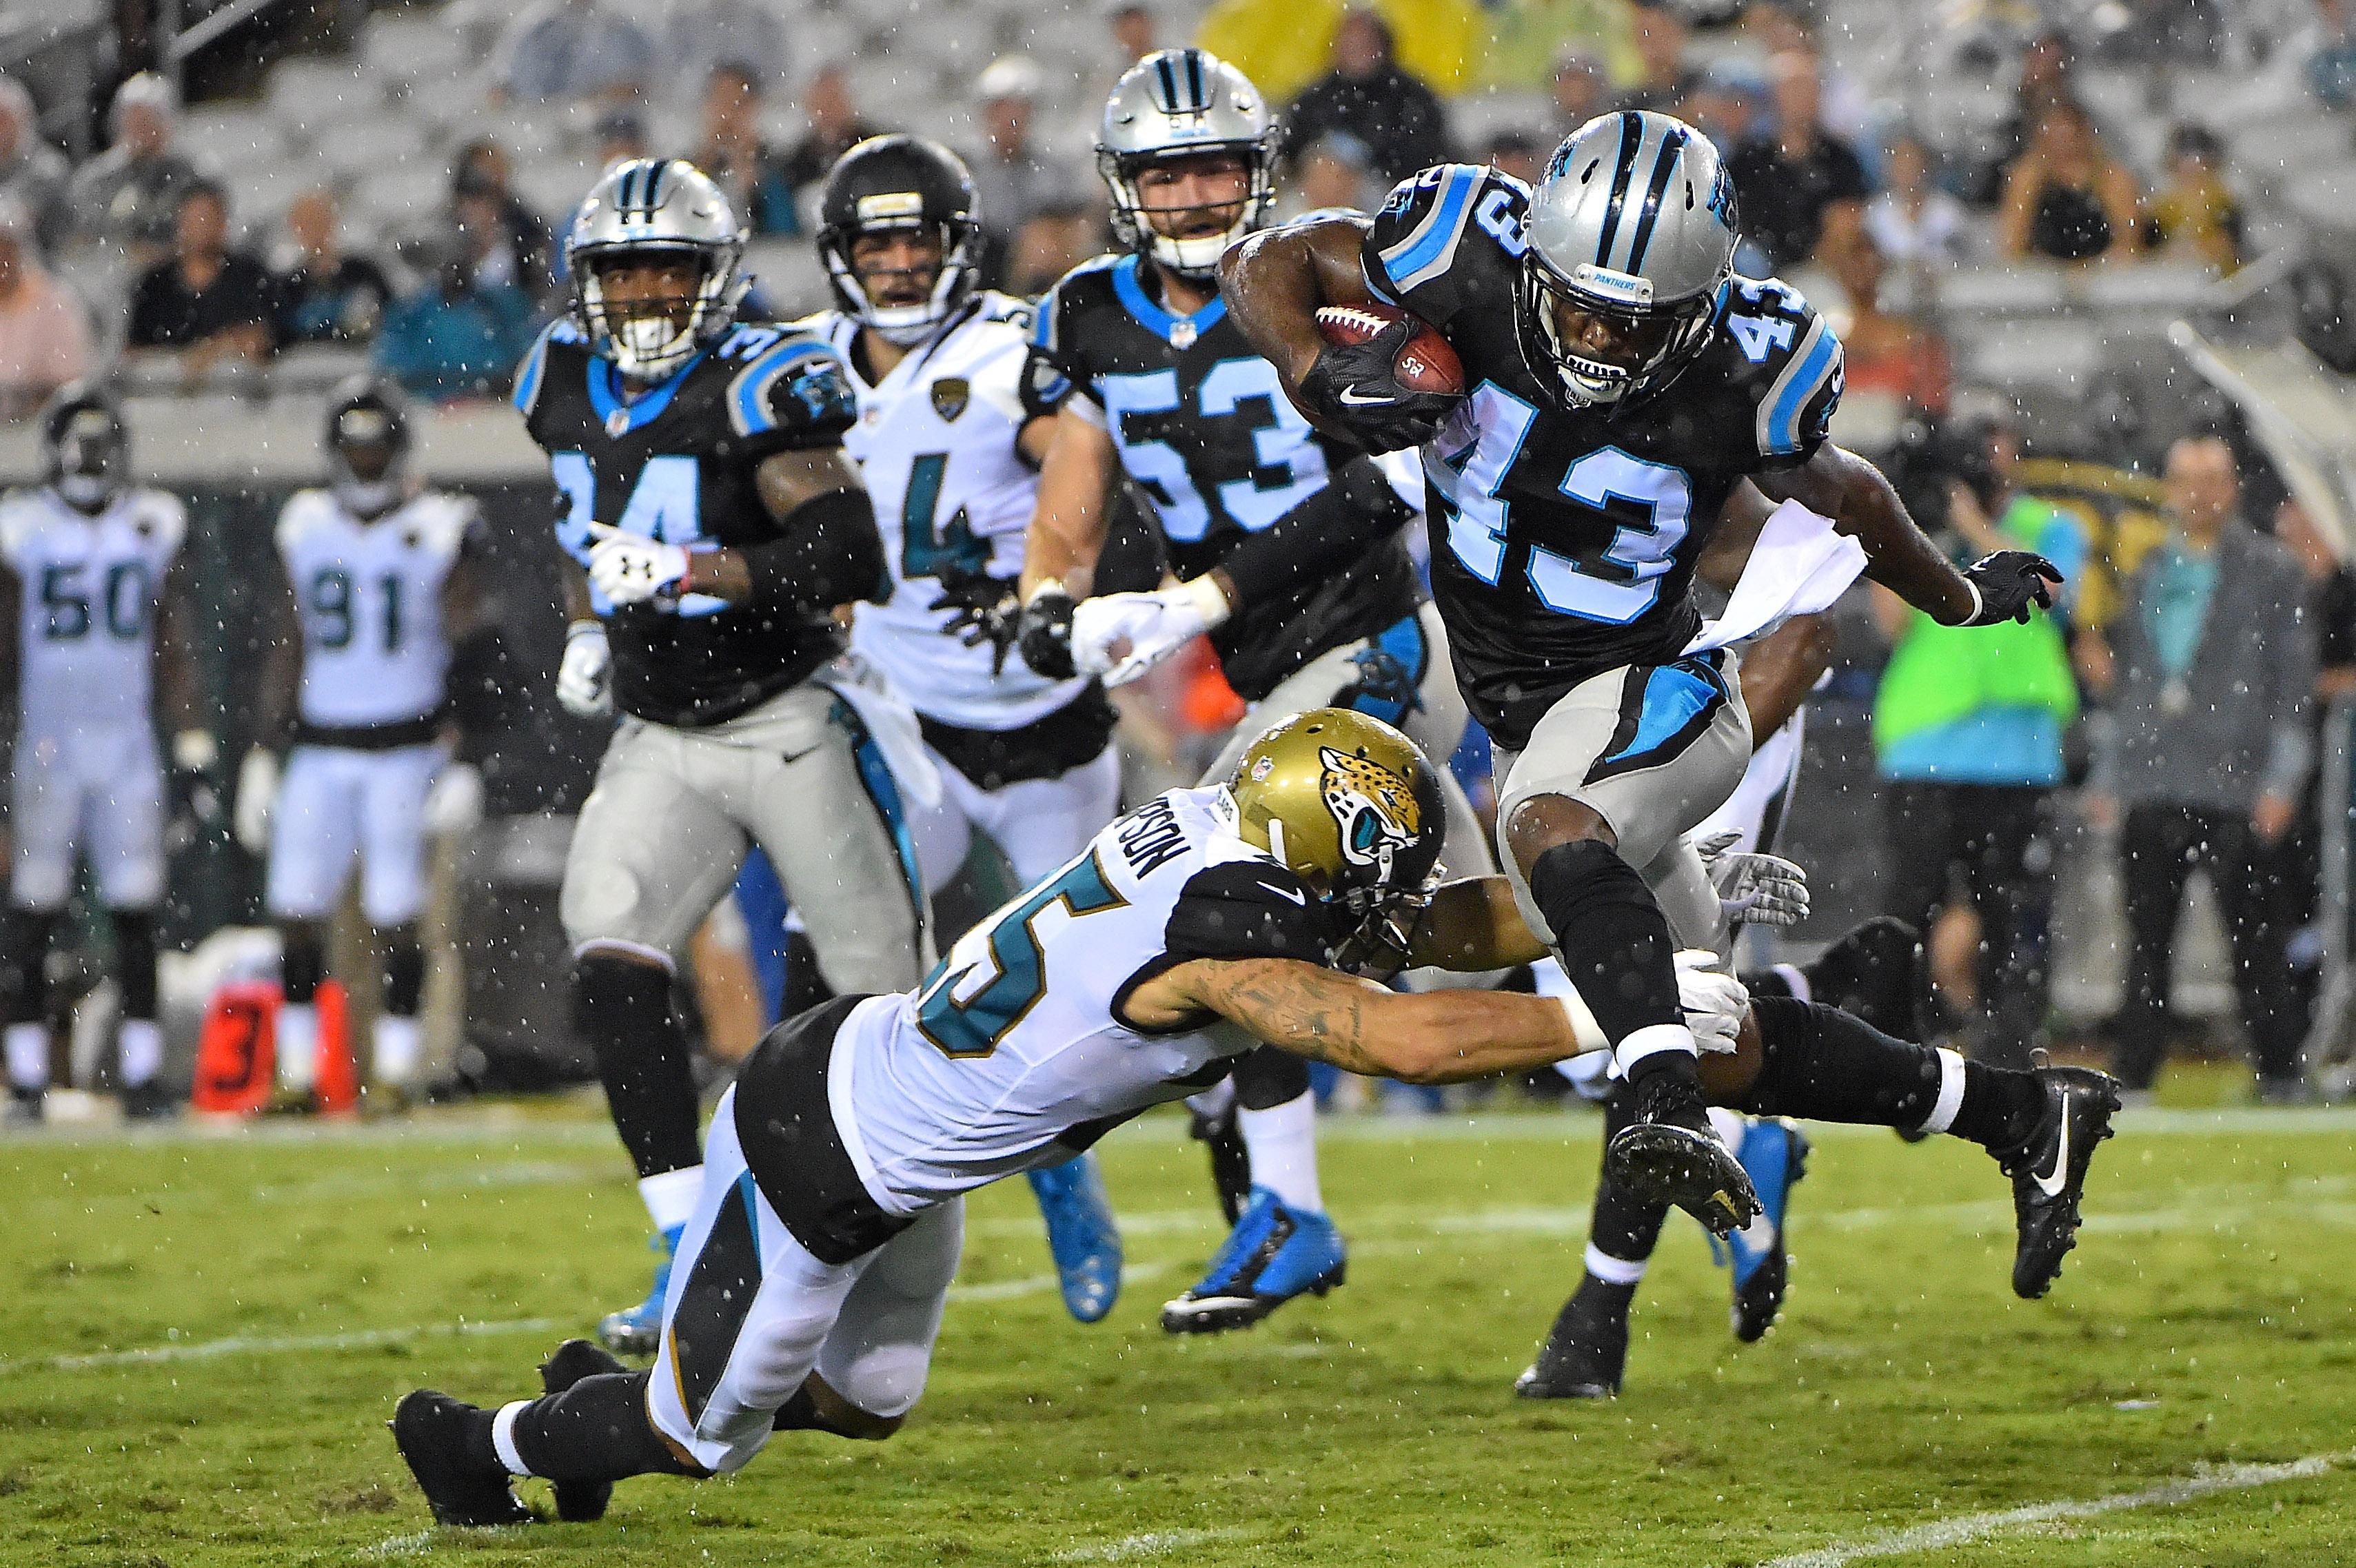 JACKSONVILLE, Fla. (FNN SPORTS) - The Jacksonville Jaguars struggled against the Carolina Panthers at EverBank Field Thursday. Photo: Jasen Vinlove/USA TODAY Sports.